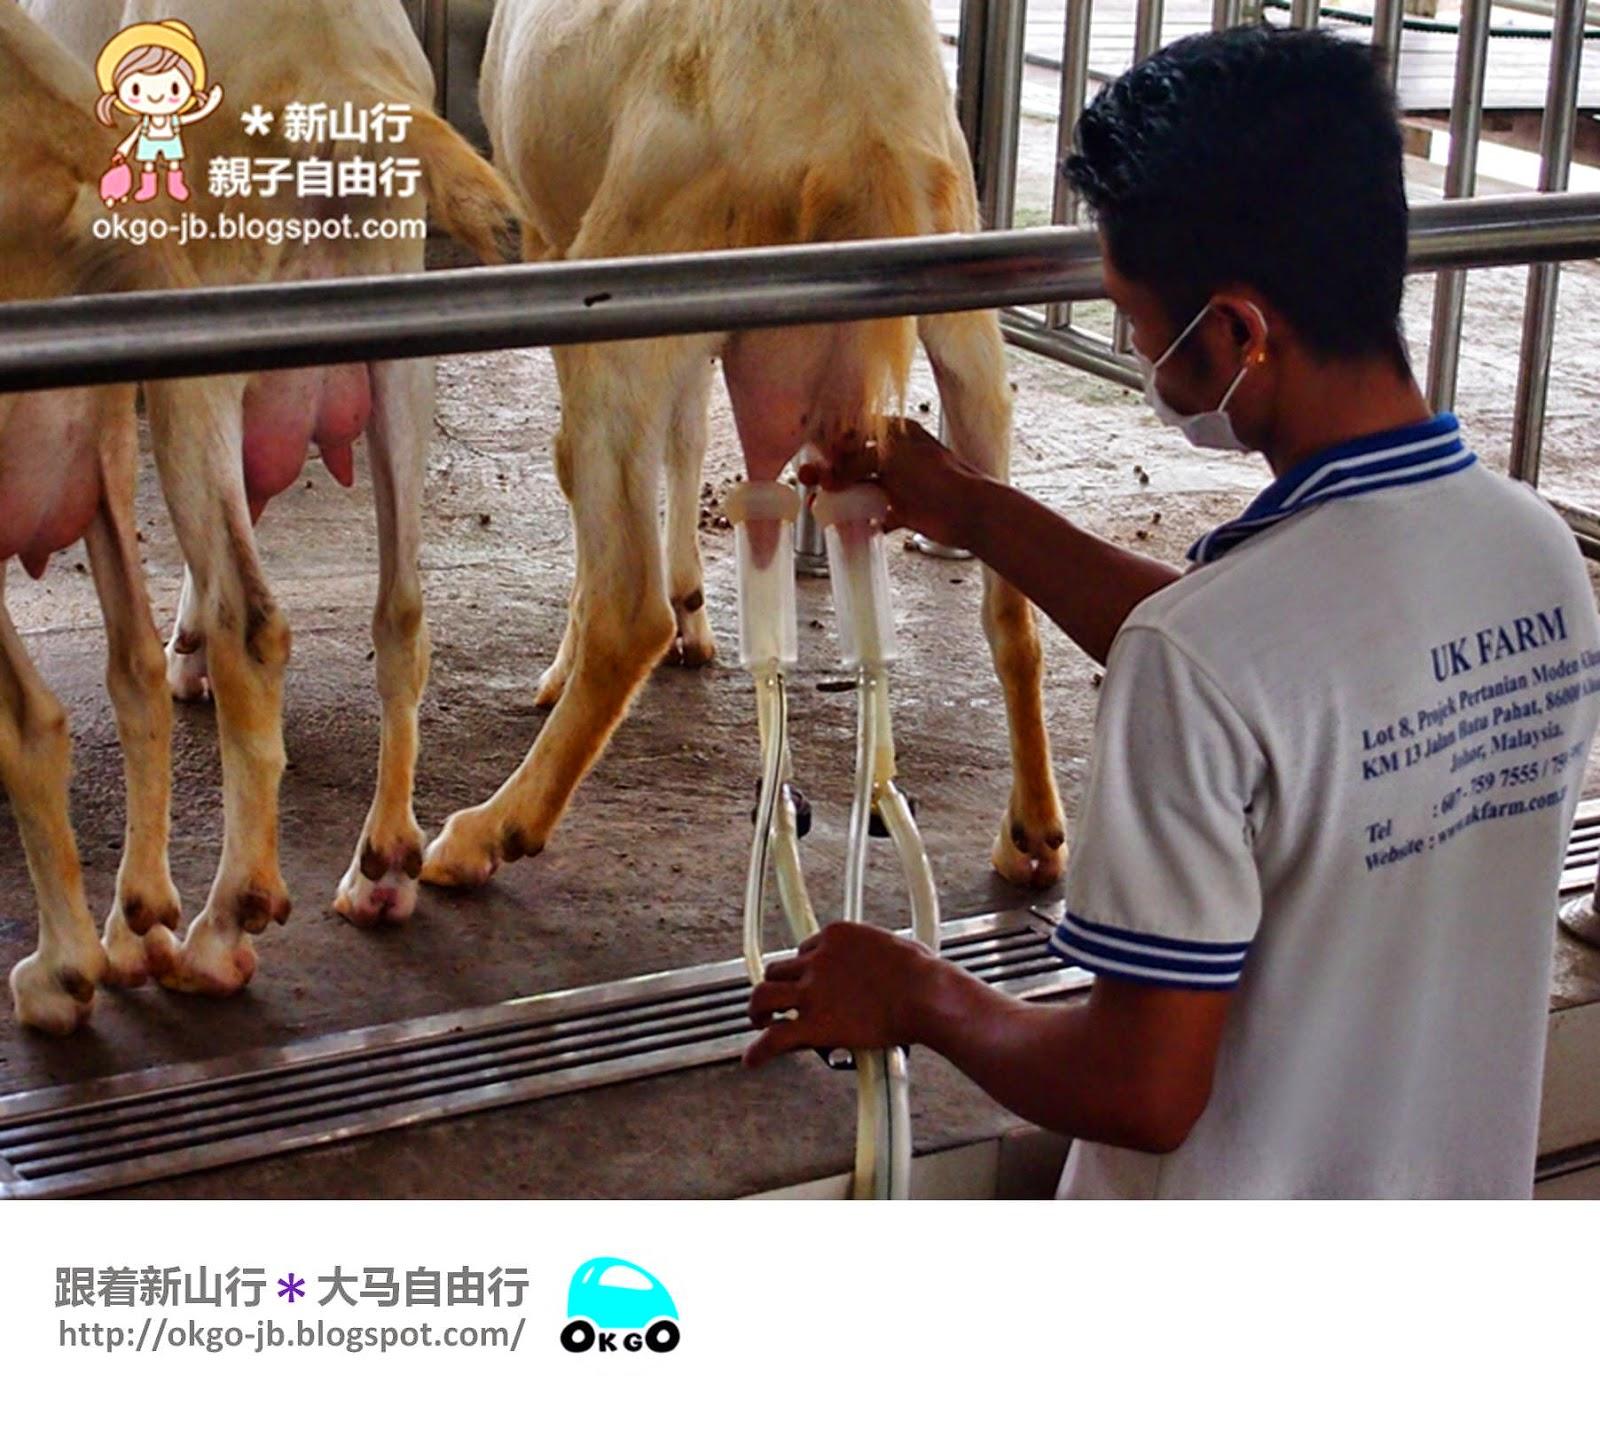 Kluang UK Farm goat milking